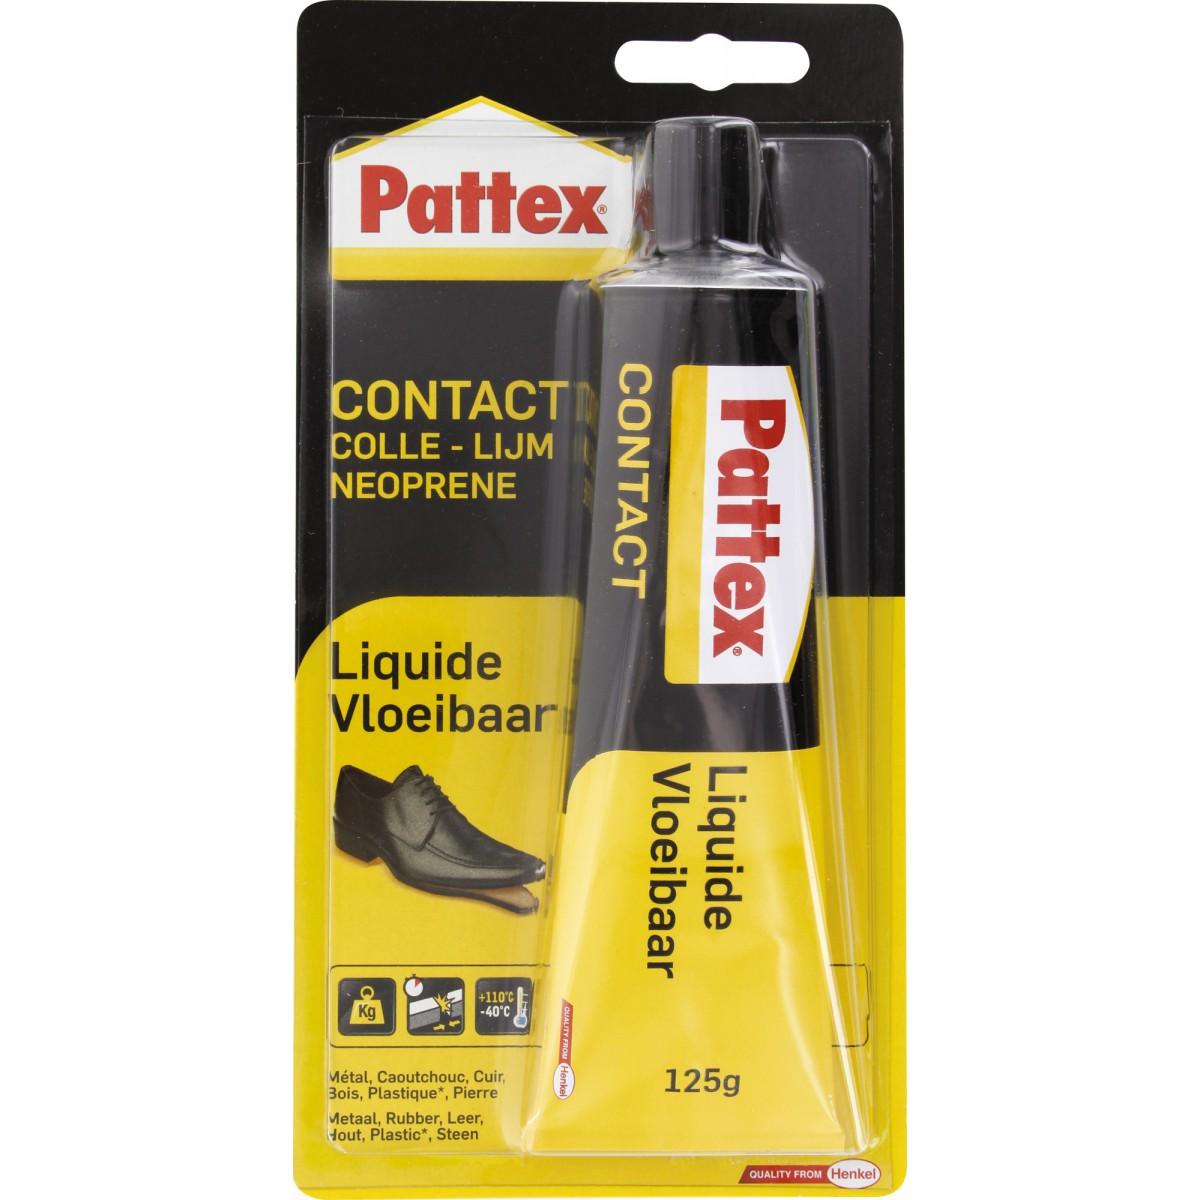 Colle contact Néoprène Pattex - Liquide - Tube 125 g